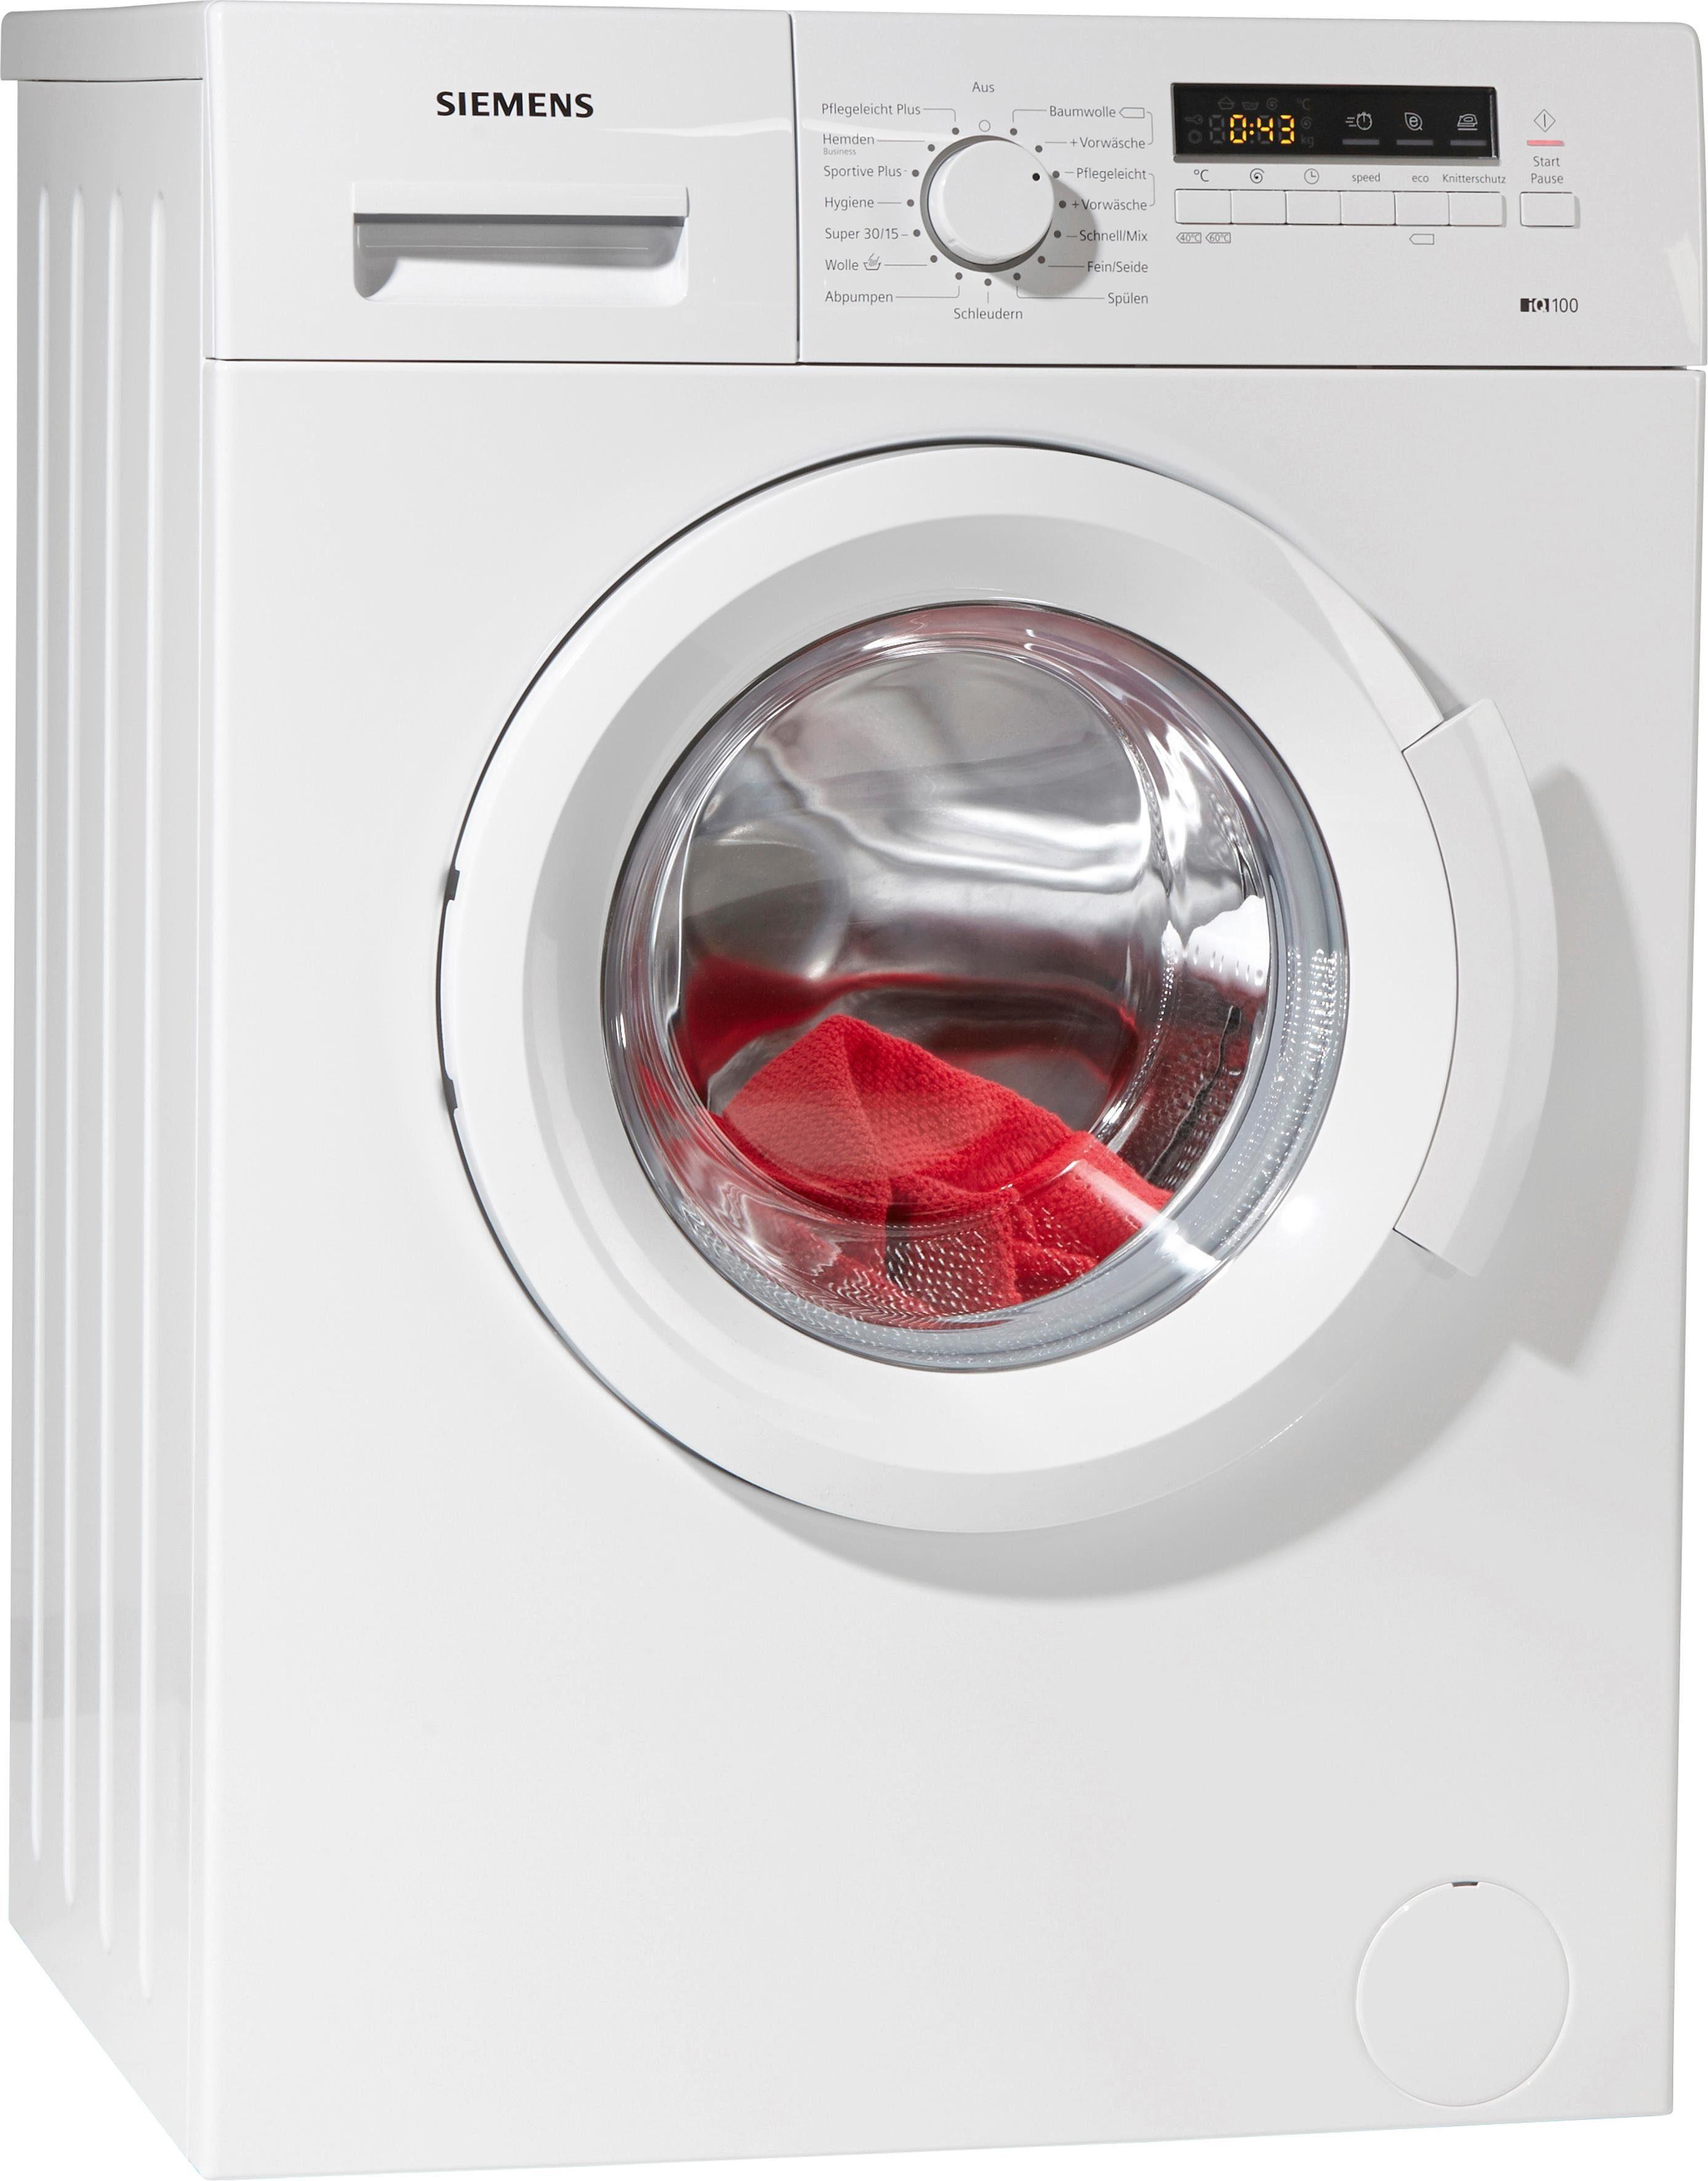 SIEMENS Waschmaschine iQ100 WM14B2ECO, A+++, 6 kg, 1400 U/Min